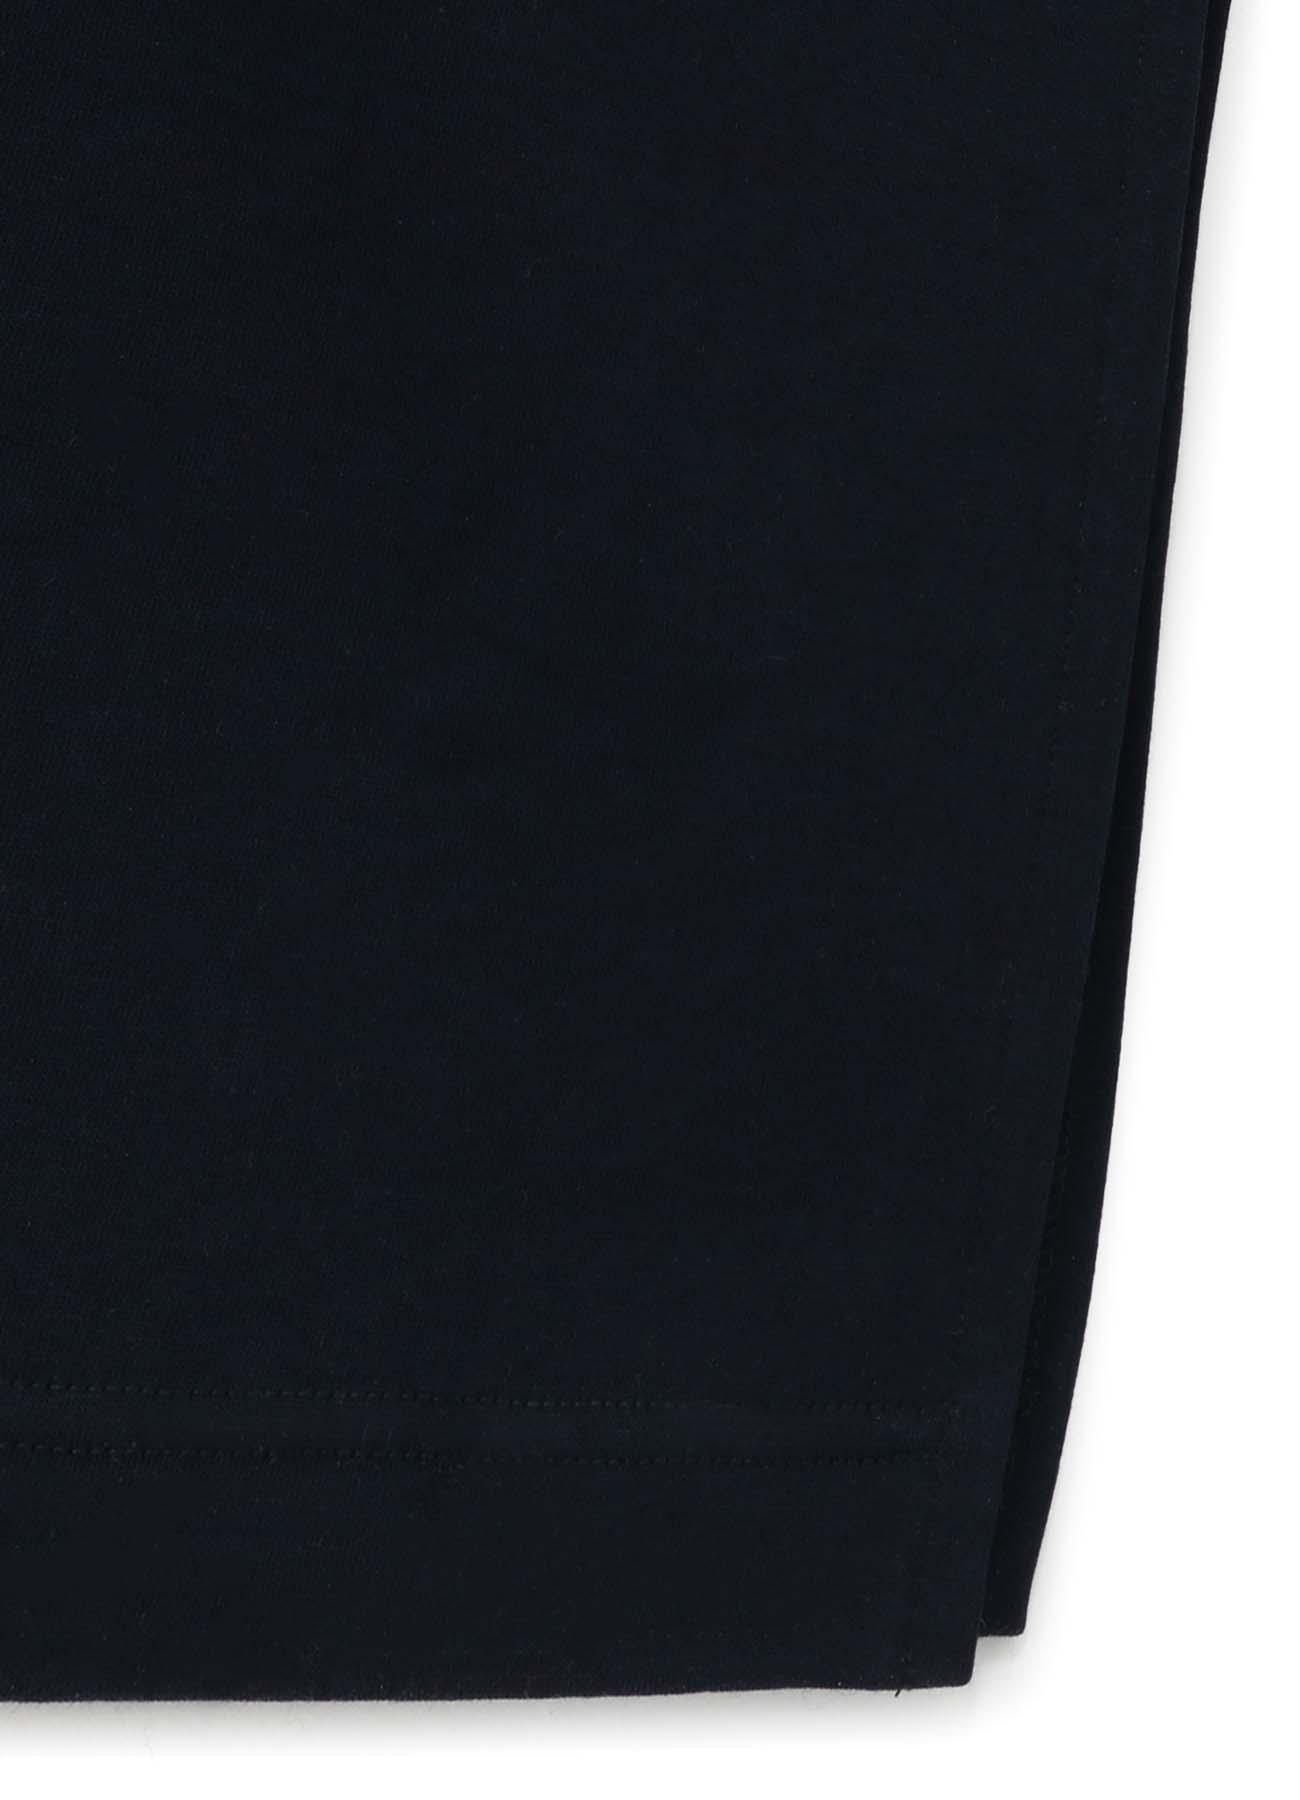 COTTON FLEECE VERITCAL PATCH DRESS